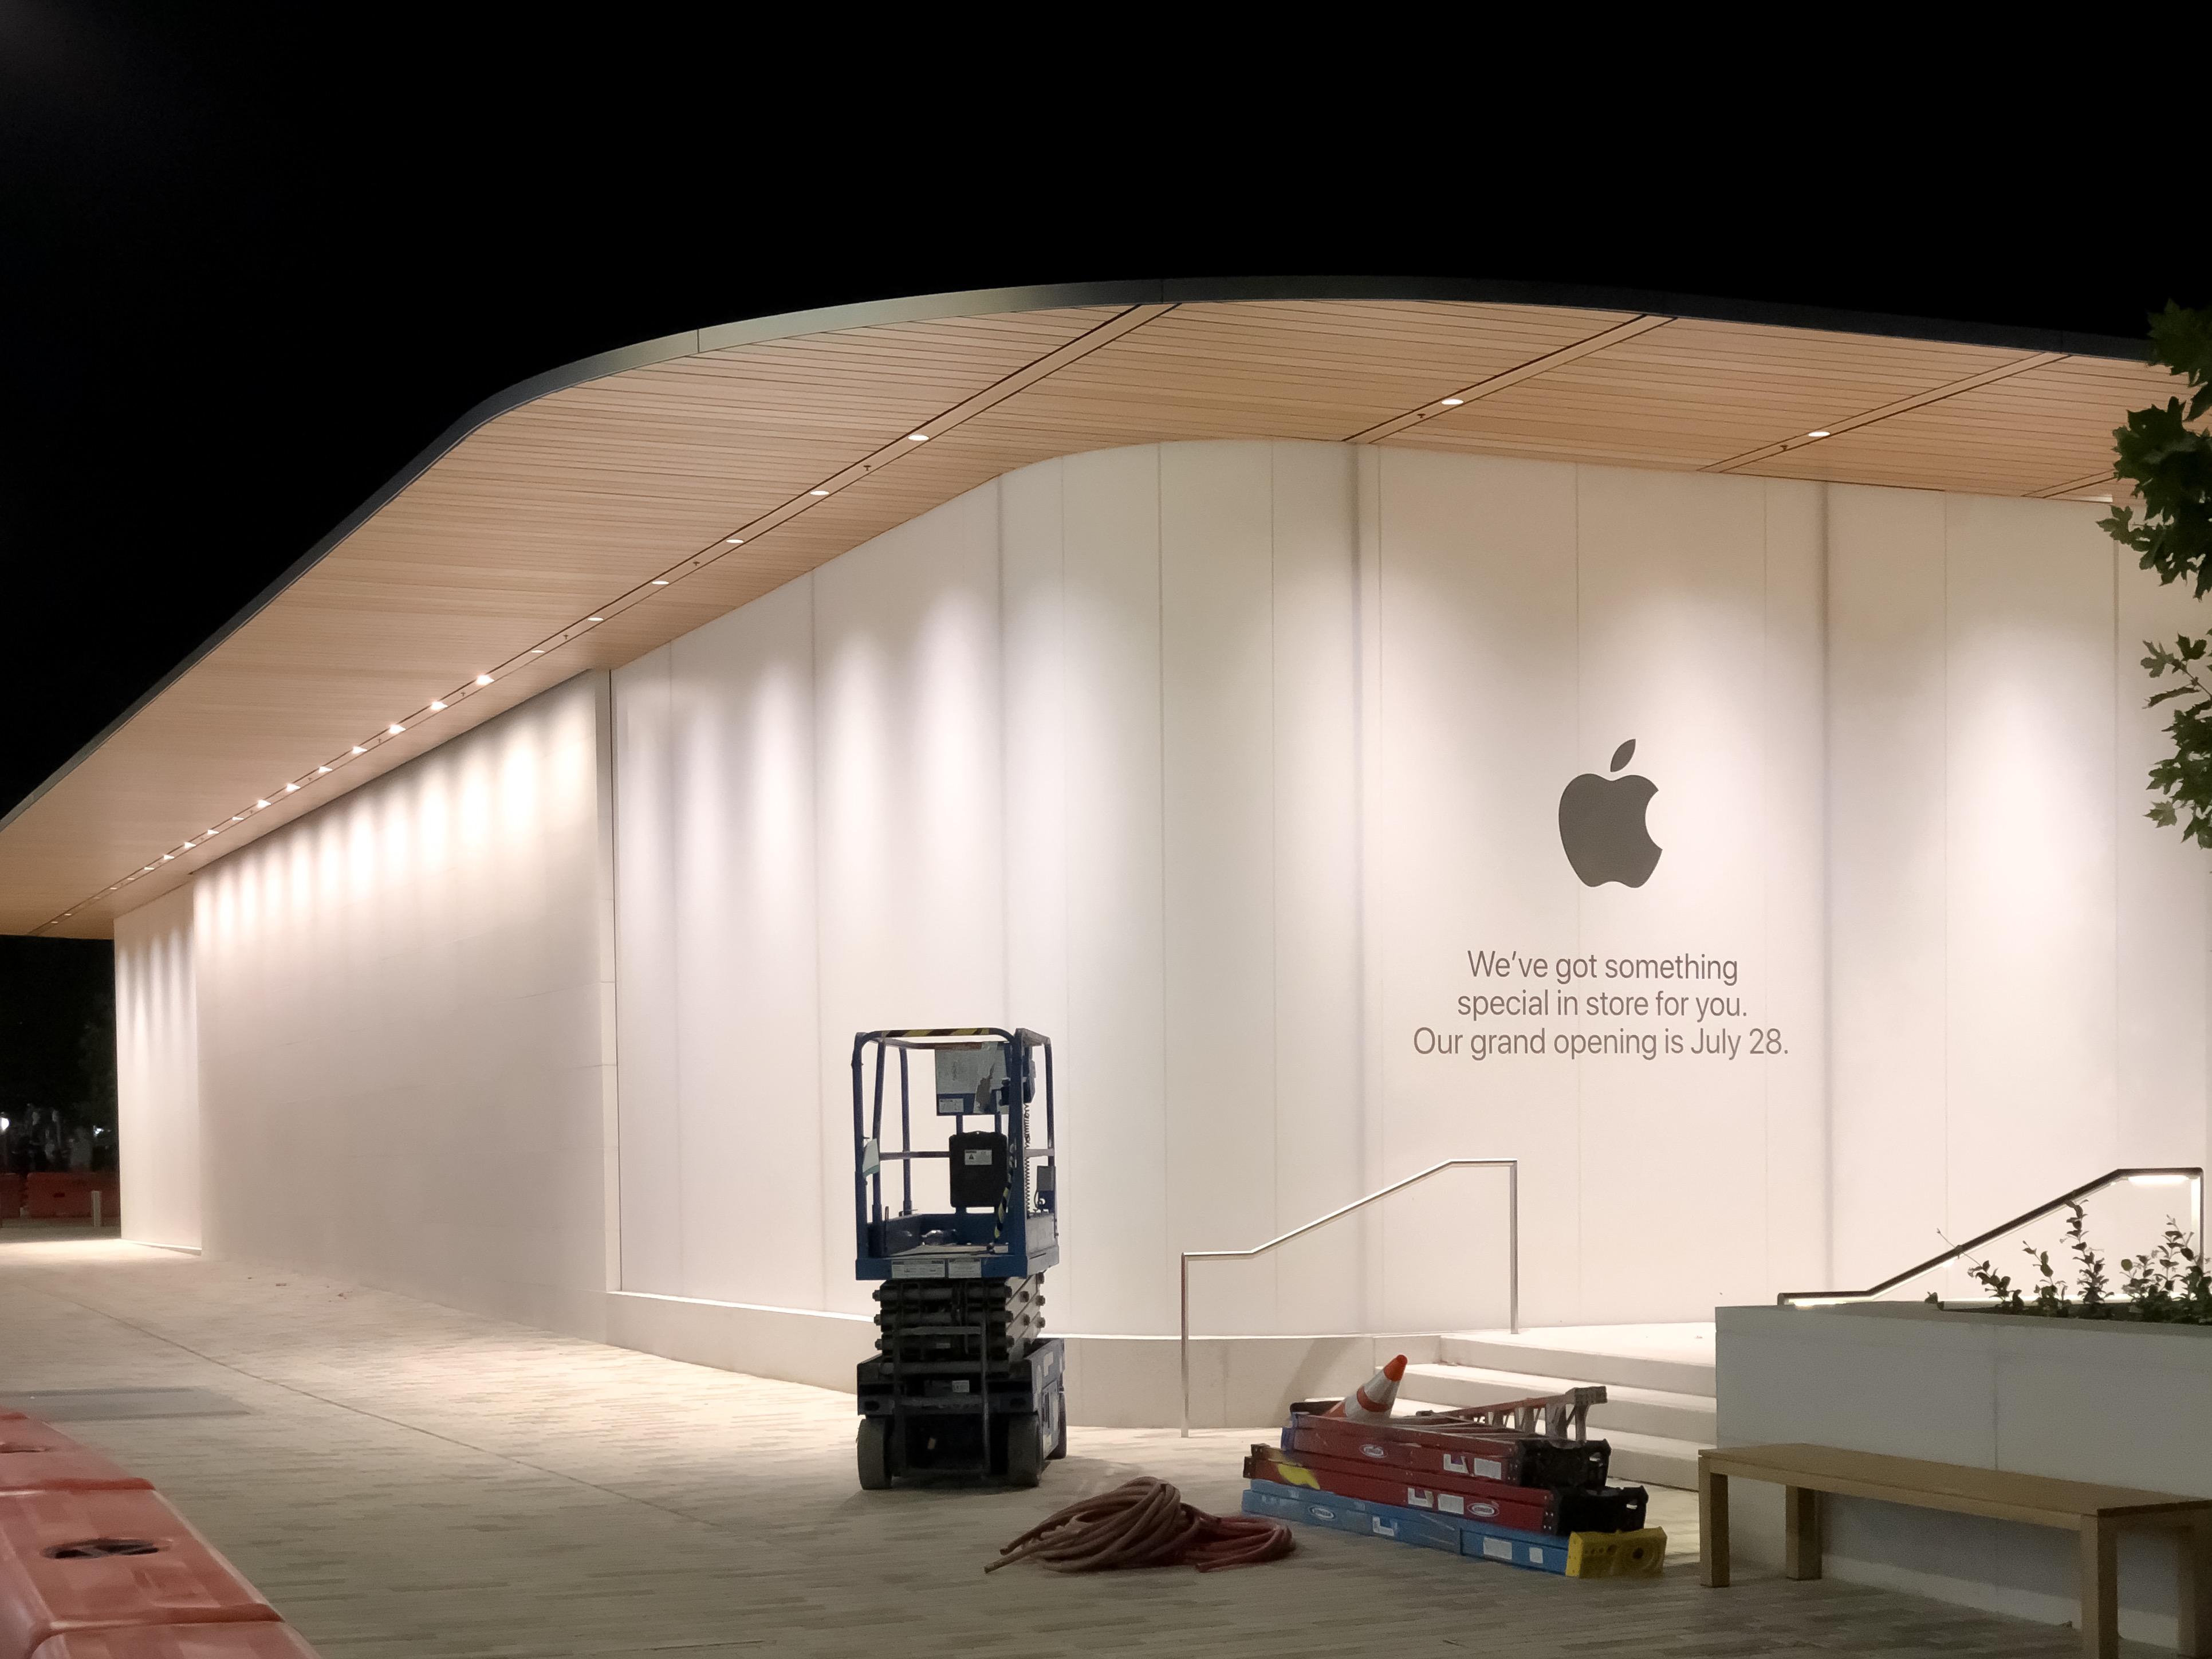 Apple Store Under Construction